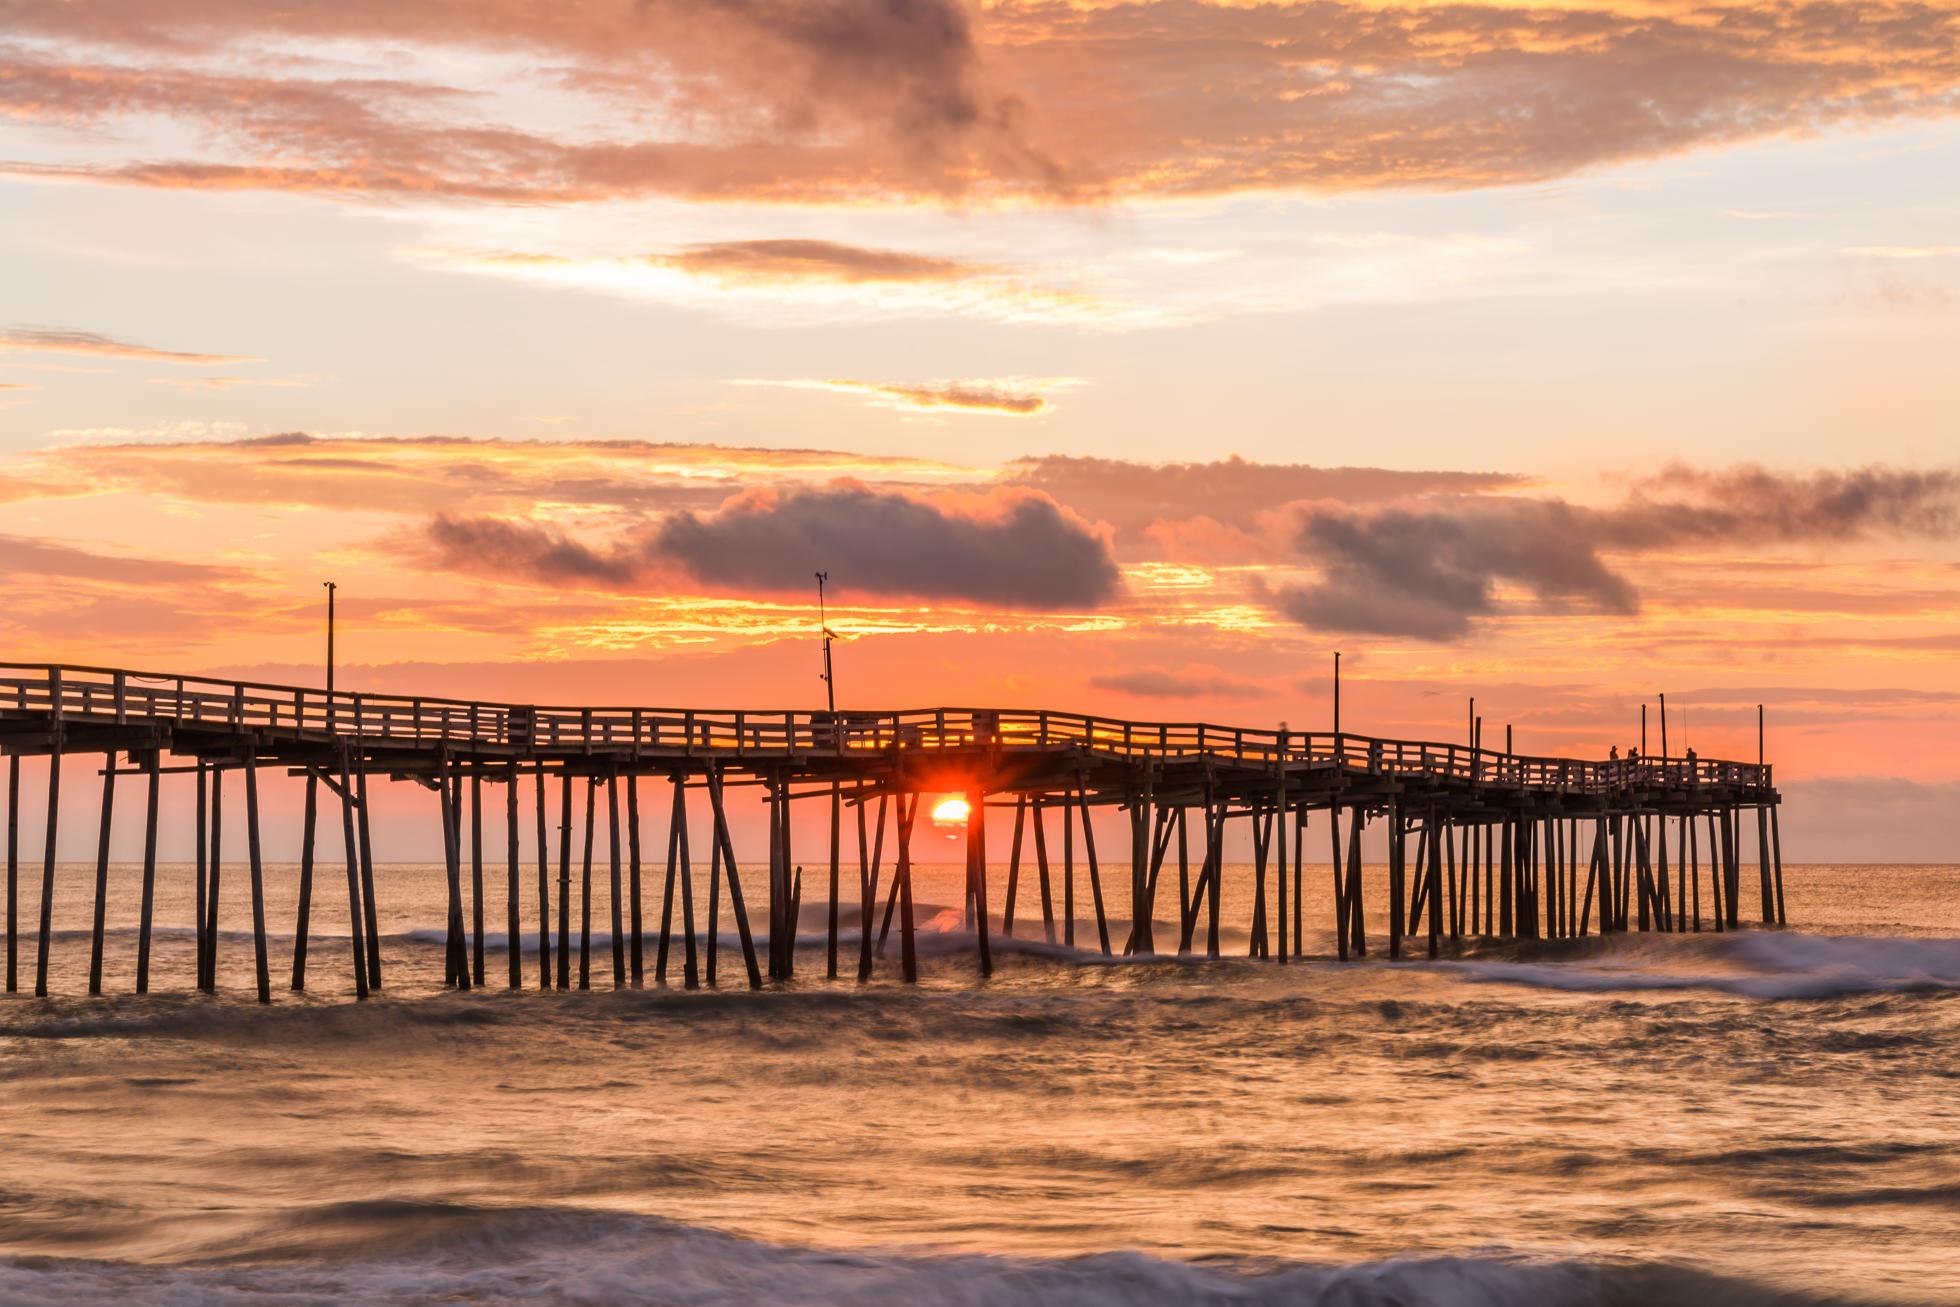 Sunrise at the avon fishing pier outer banks north carolina